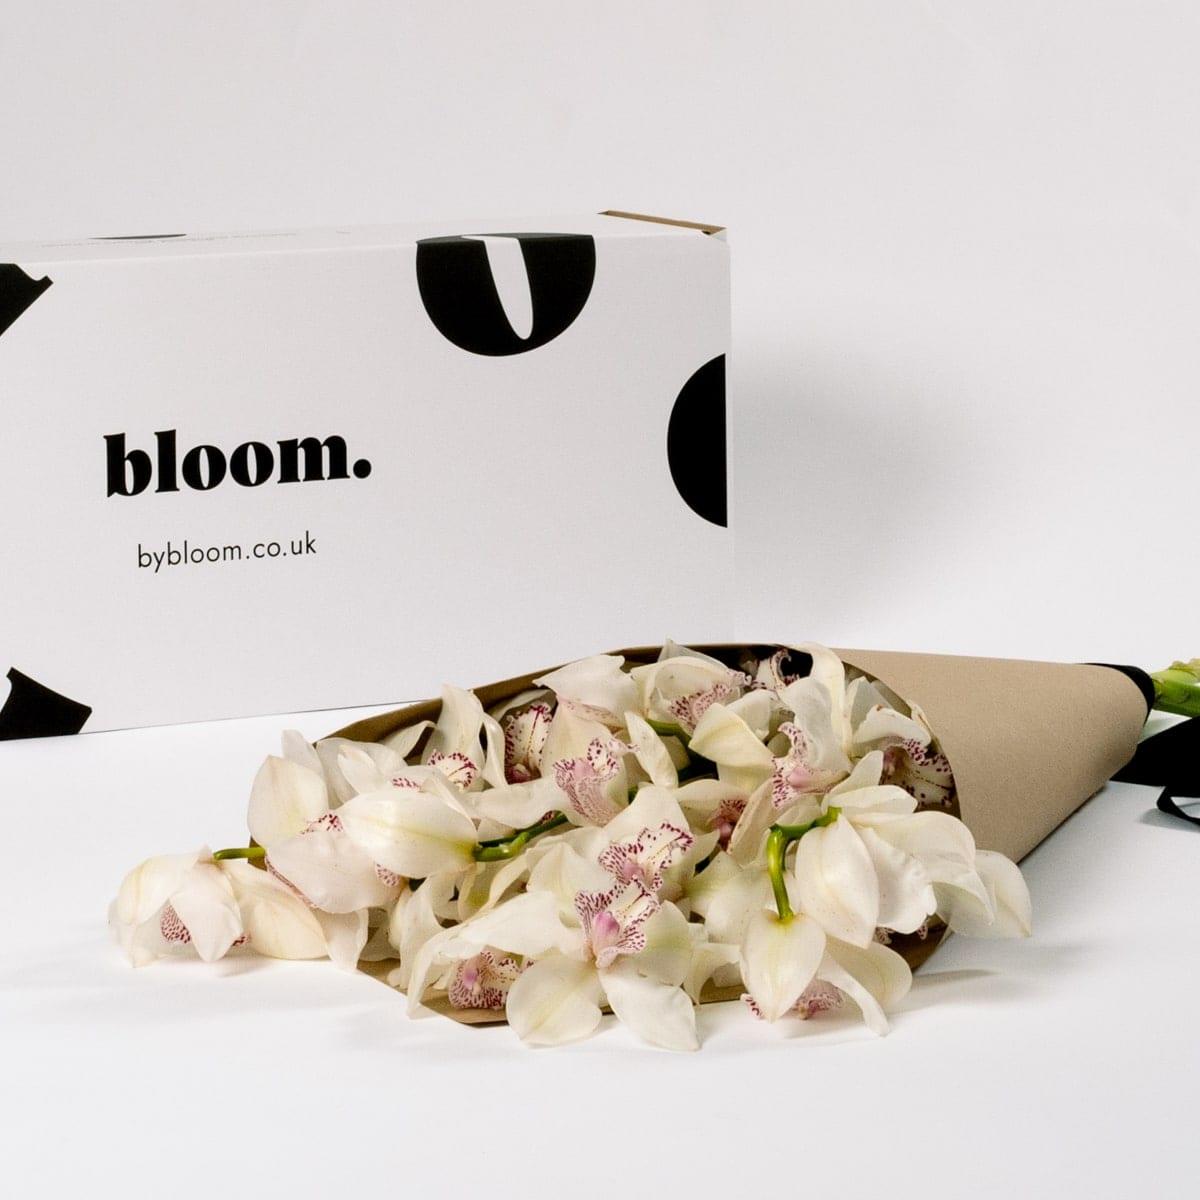 Bloom Flower Delivery | Porcelain White Cymbidium